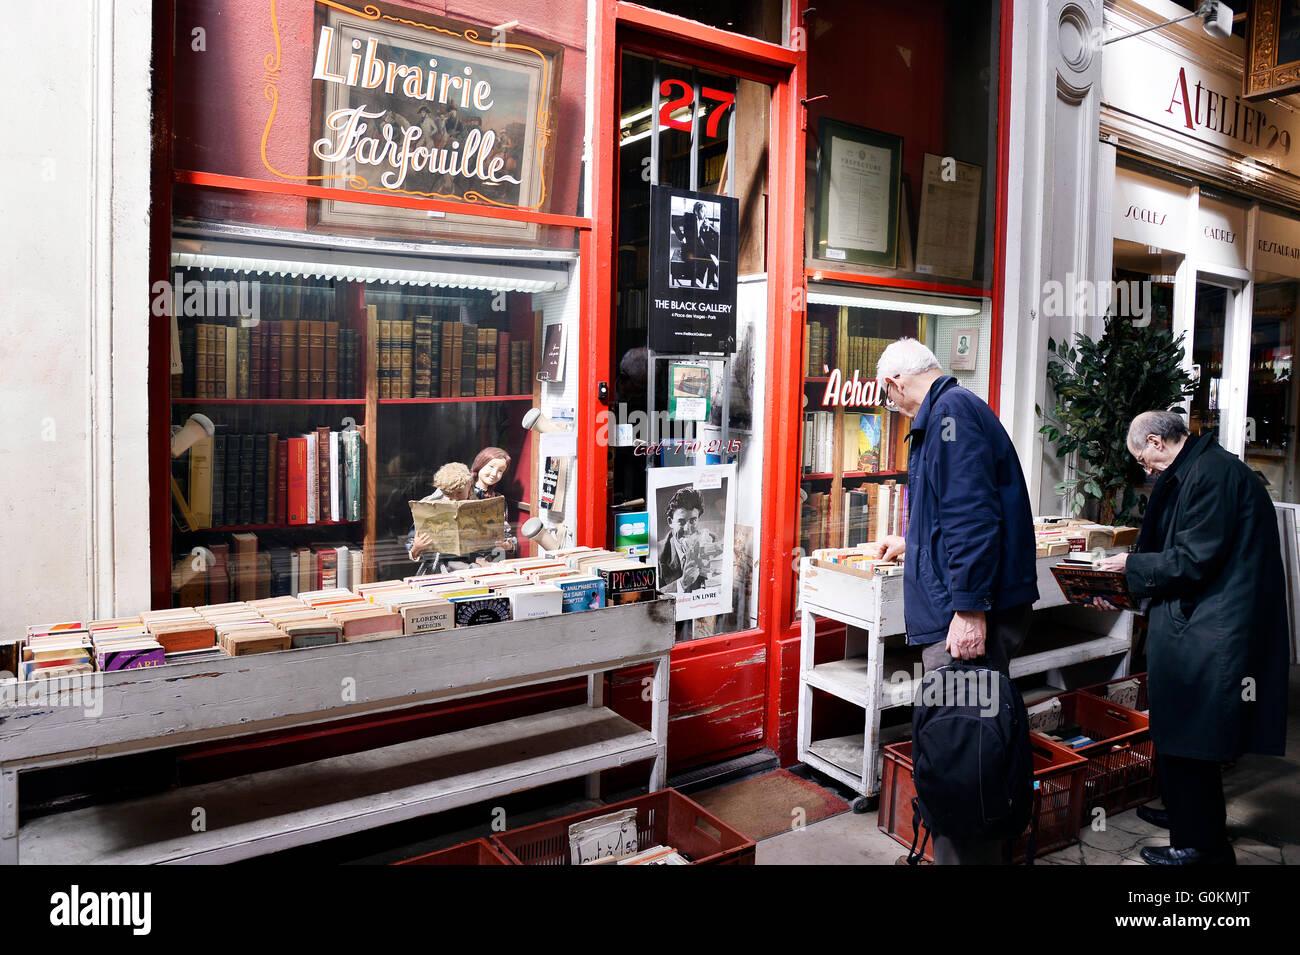 Bookstore in paris, france - Stock Image